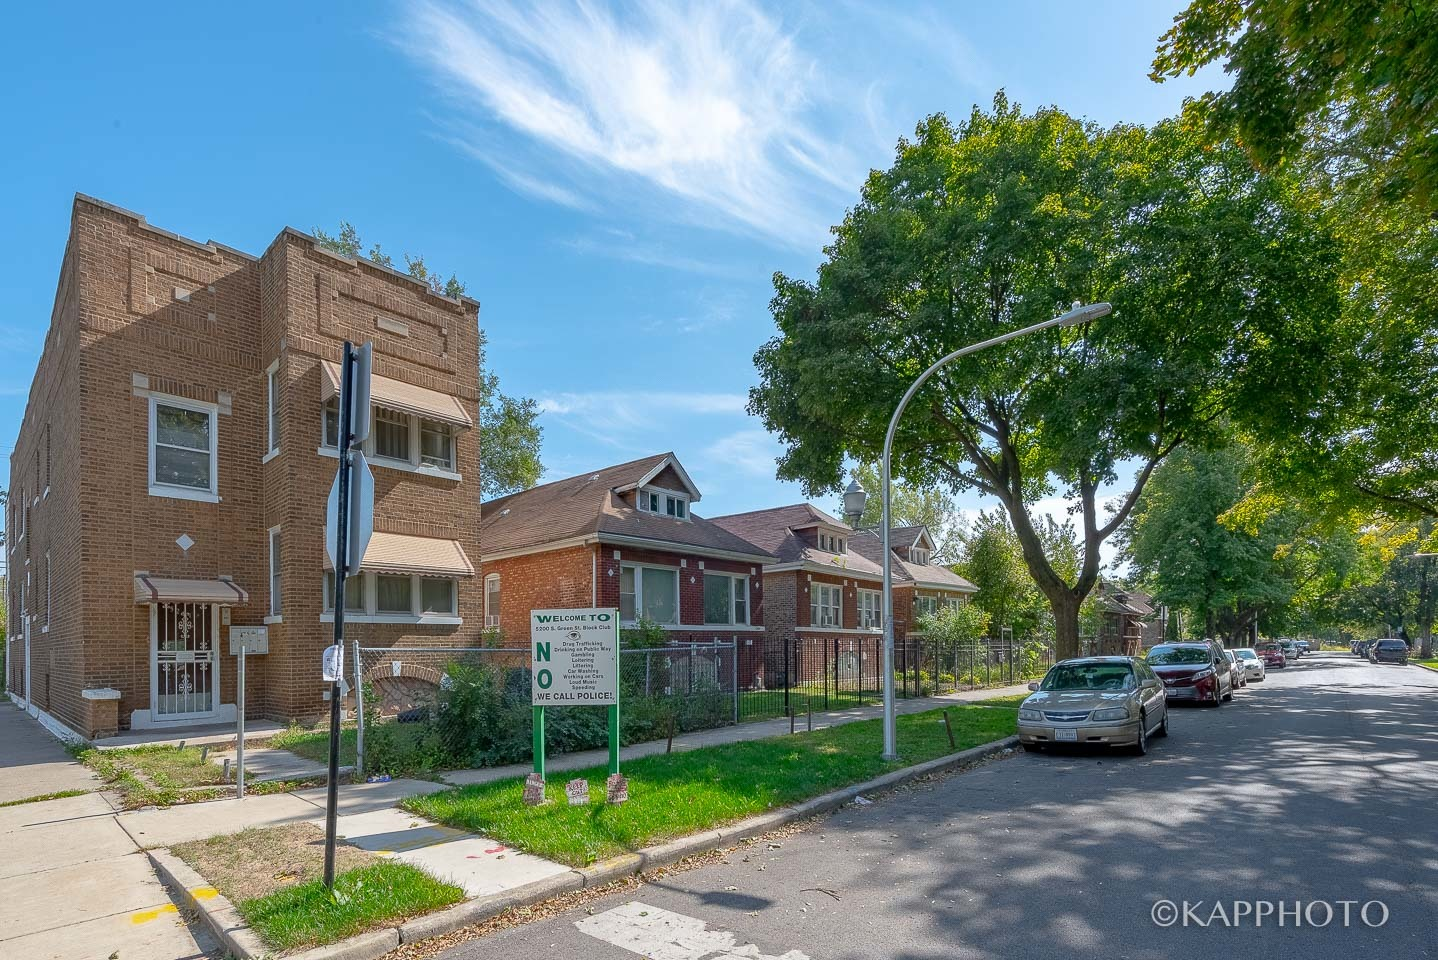 5200 Green ,Chicago, Illinois 60609